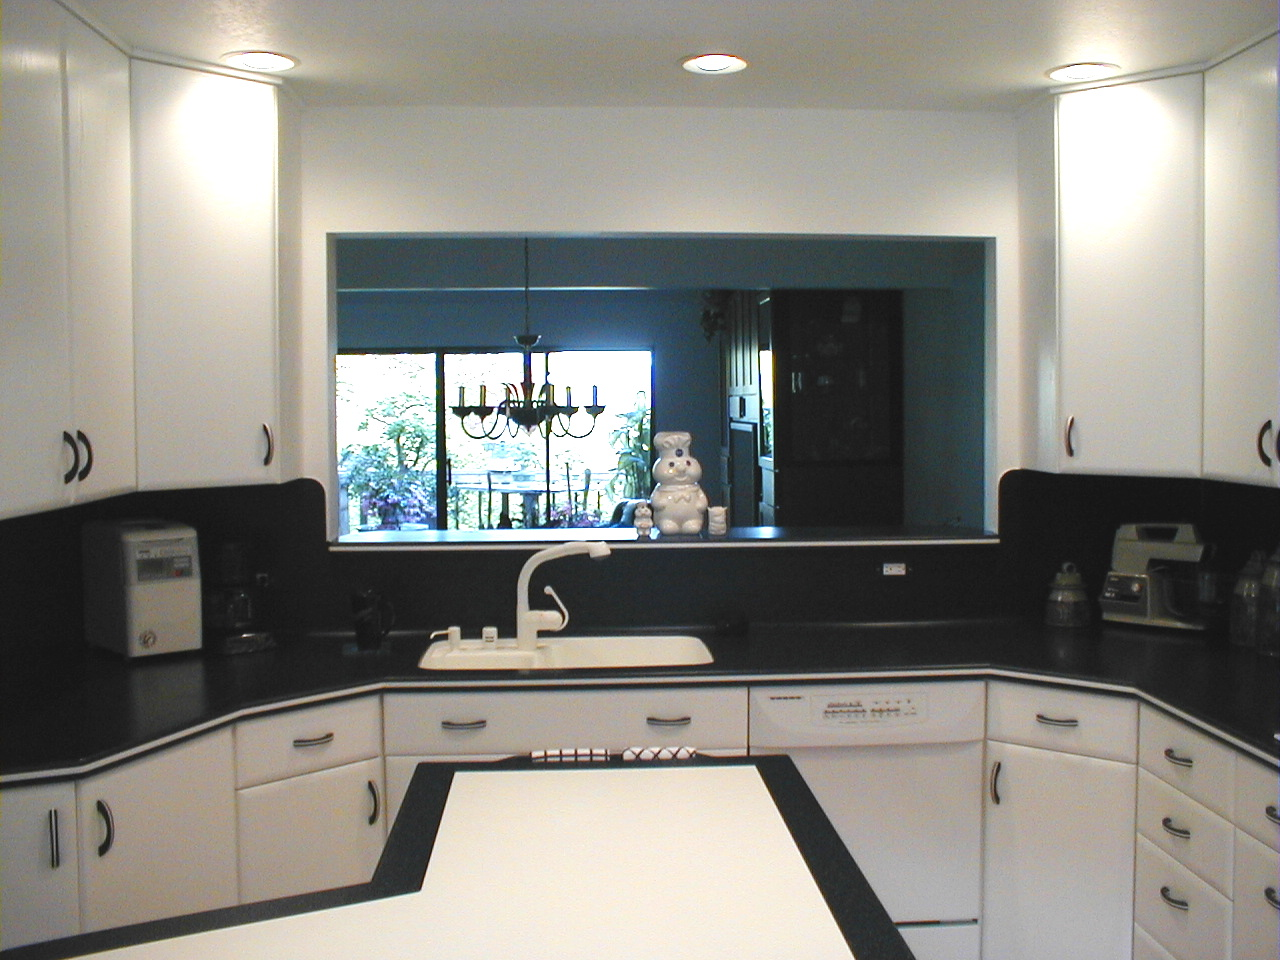 Sink Shelf Kitchen Photo  1  Kitchen Ideas. Dream Kitchen Playset. Grey And Green Kitchen. Kitchen Organization Nashville. Kitchen Tile Youtube. Kitchen Garden Restaurant Mumbai. Brown Gloss Kitchen Units. Kitchen Interior Philippines. Kitchen Hood Operation